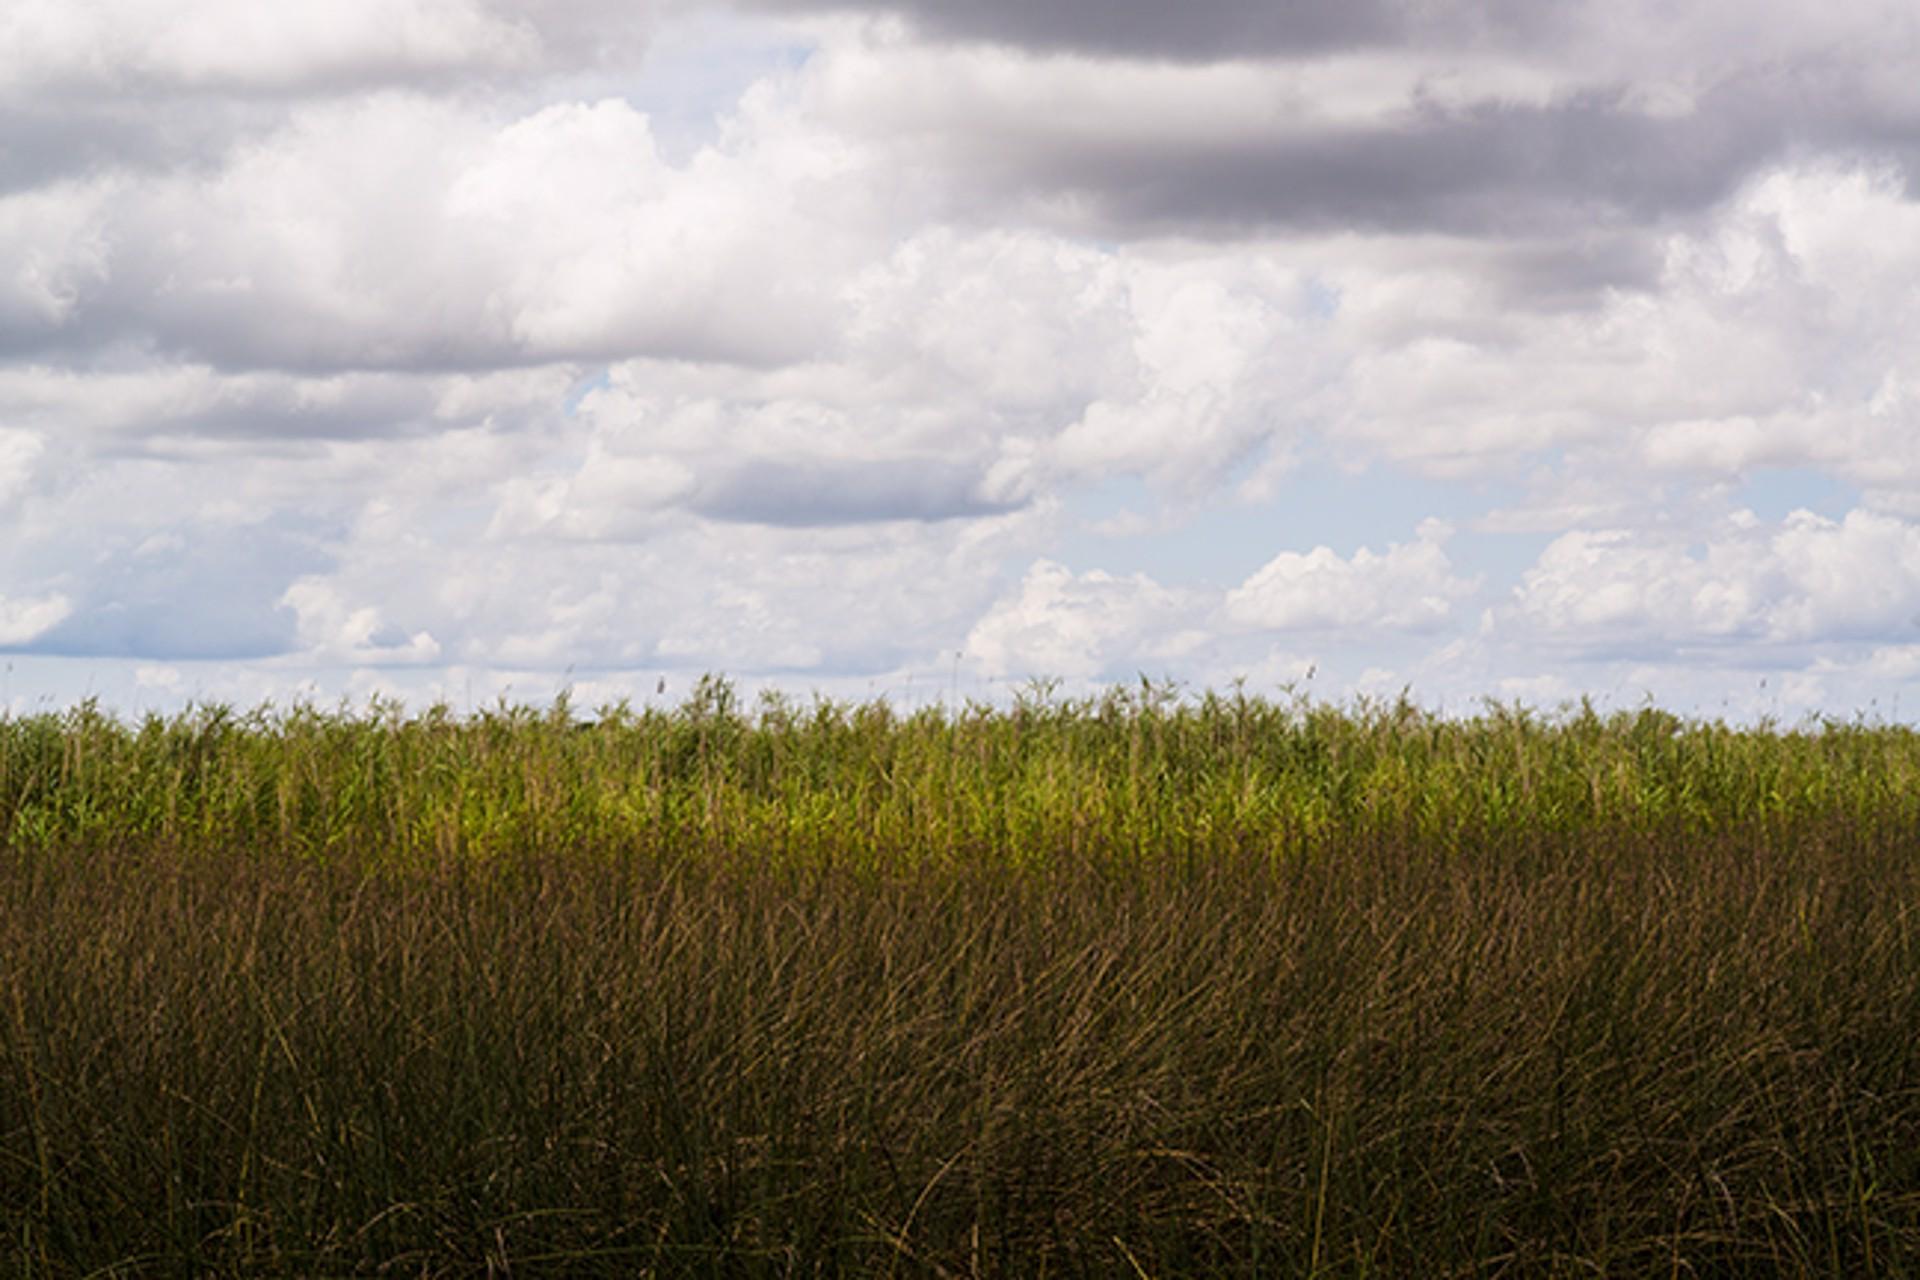 On the Inland Waterway Louisiana by Frank Sherwood White